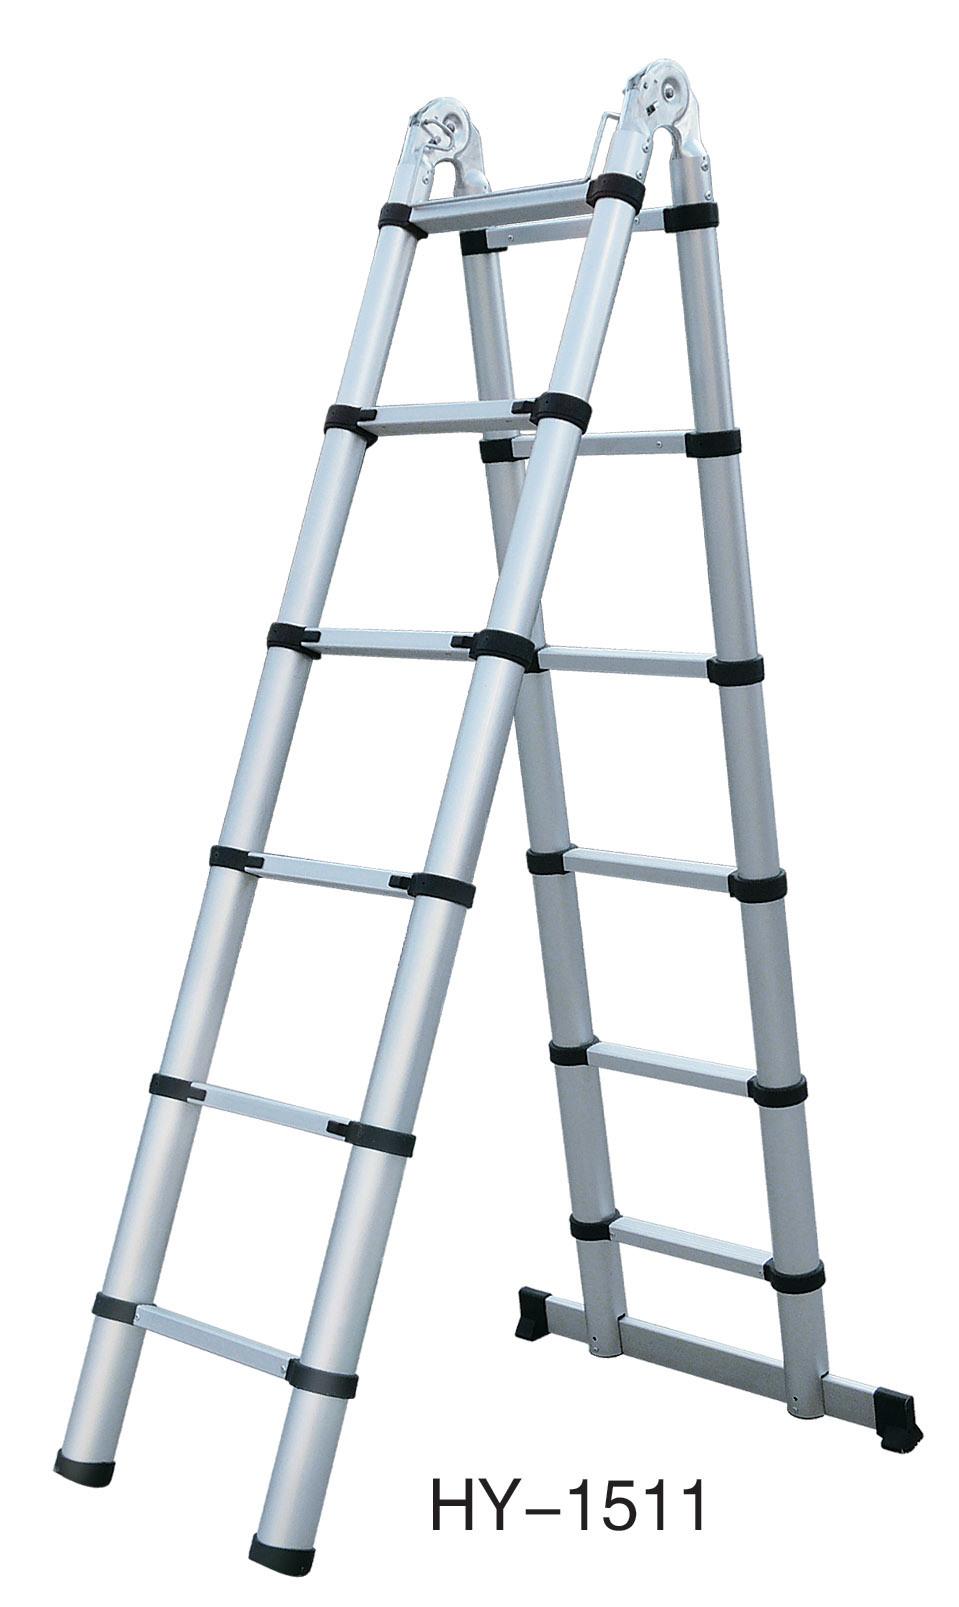 Folding Extension Ladder : China folding extension ladder hy aluminum